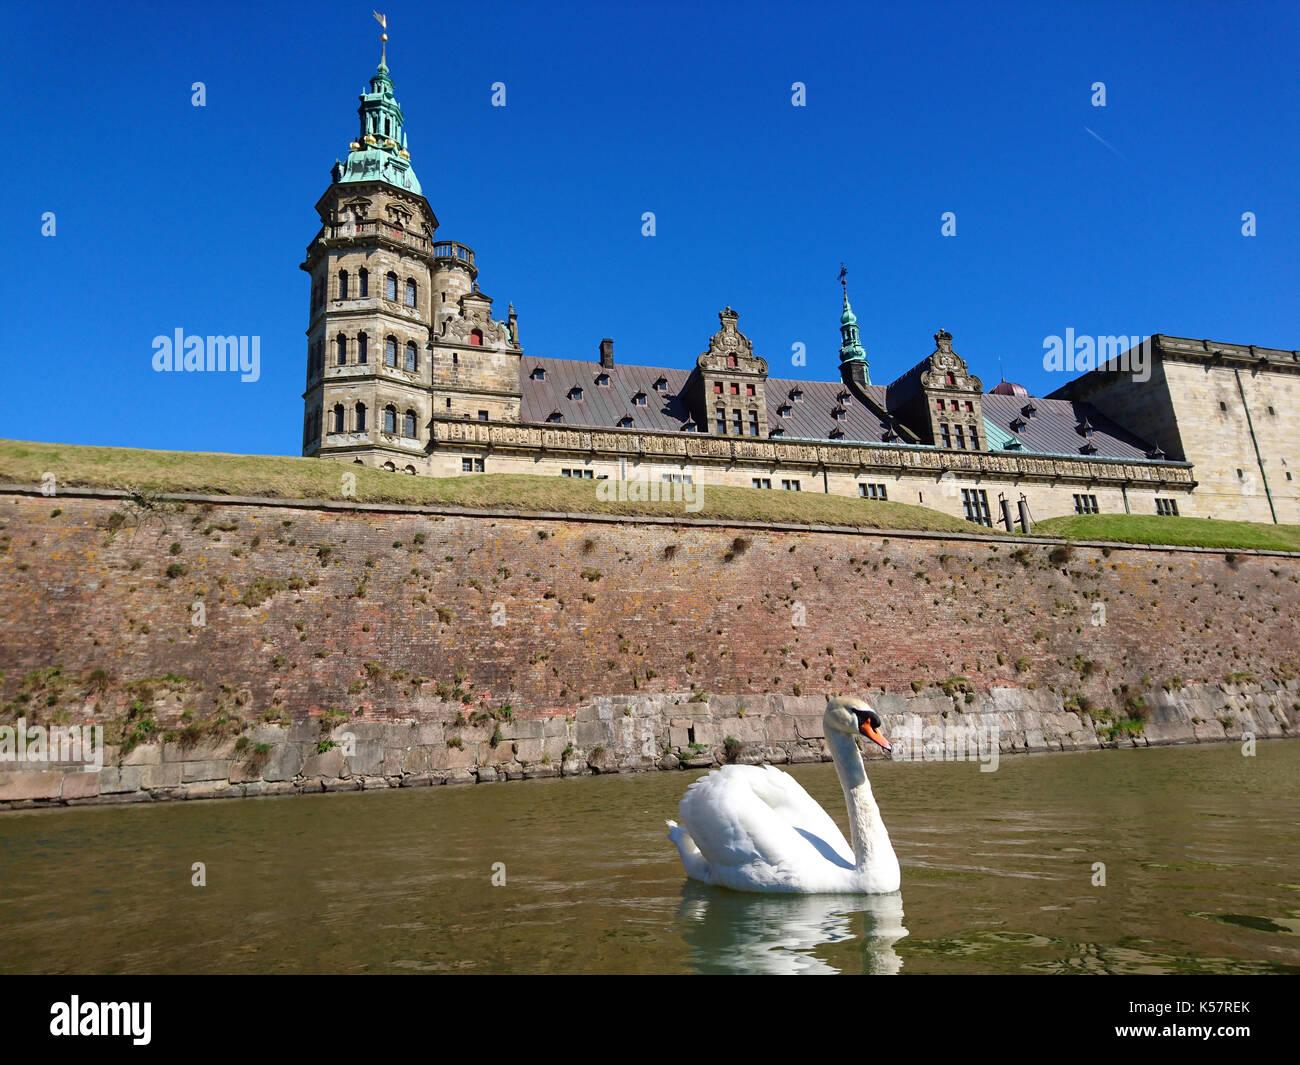 Kronborg Castle (location of the Shakespeare´s tragedy Hamlet) in Elsinore, Denmark - Stock Image